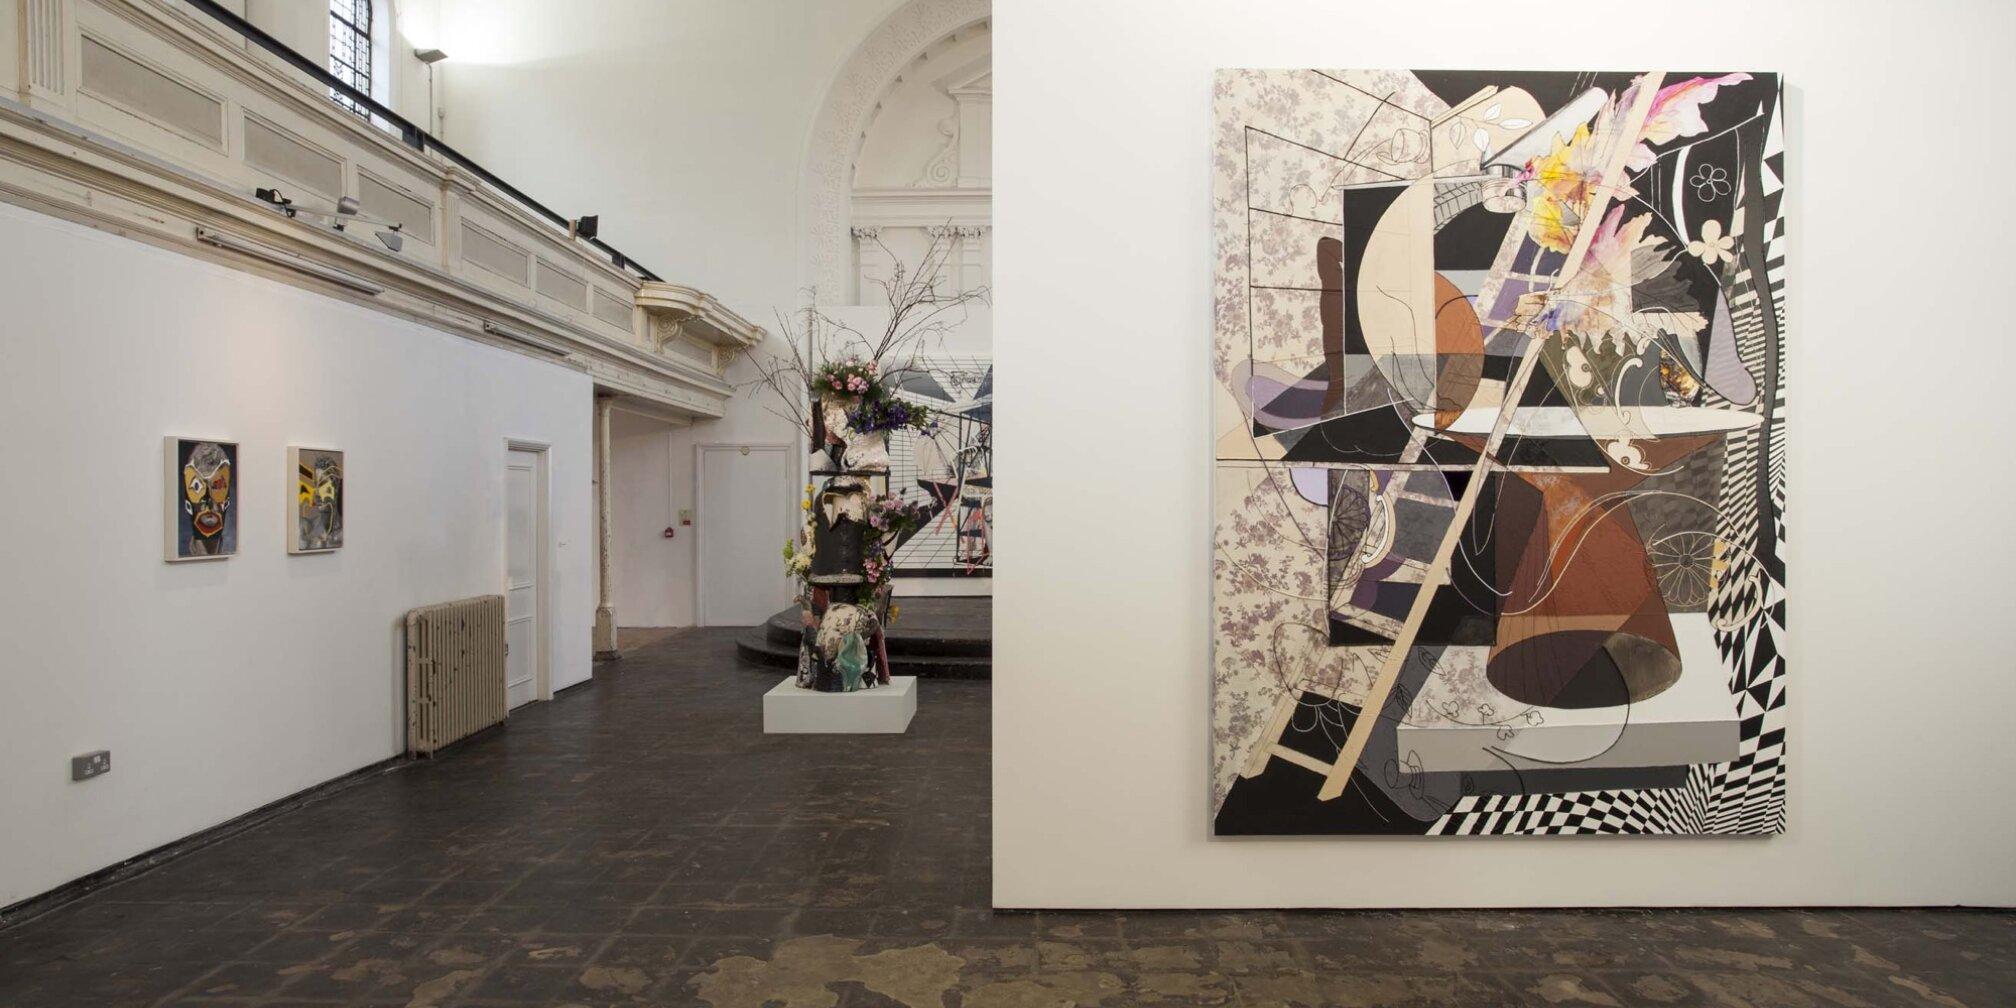 Painting from the Zabludowicz Collection: Francesca DiMattio: Vertical Arrangements